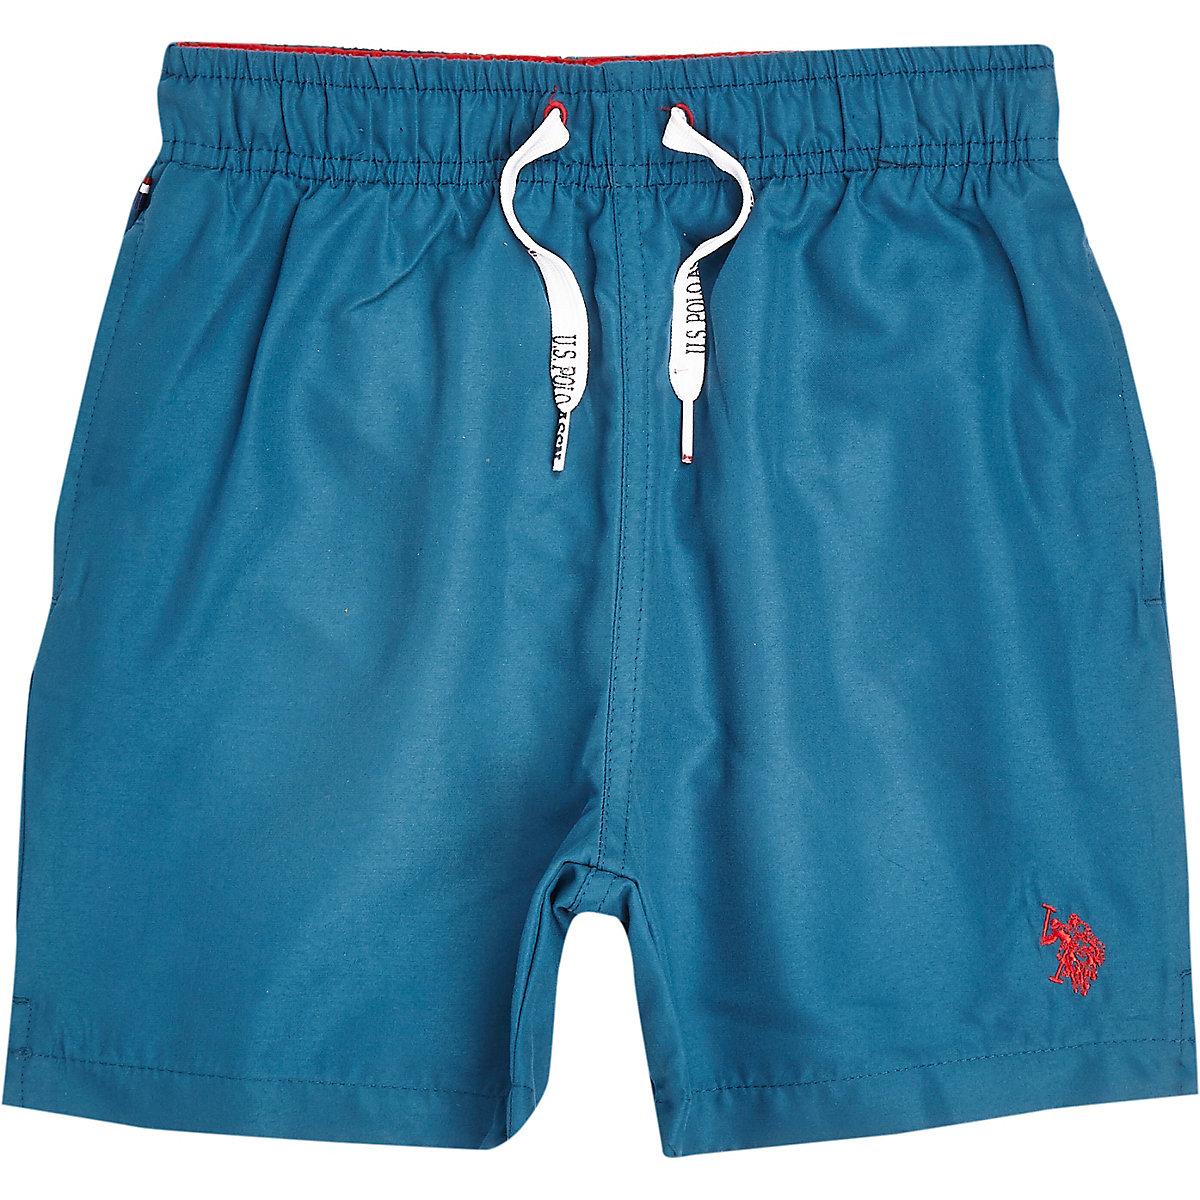 Boys blue U.S. Polo Assn. swim shorts